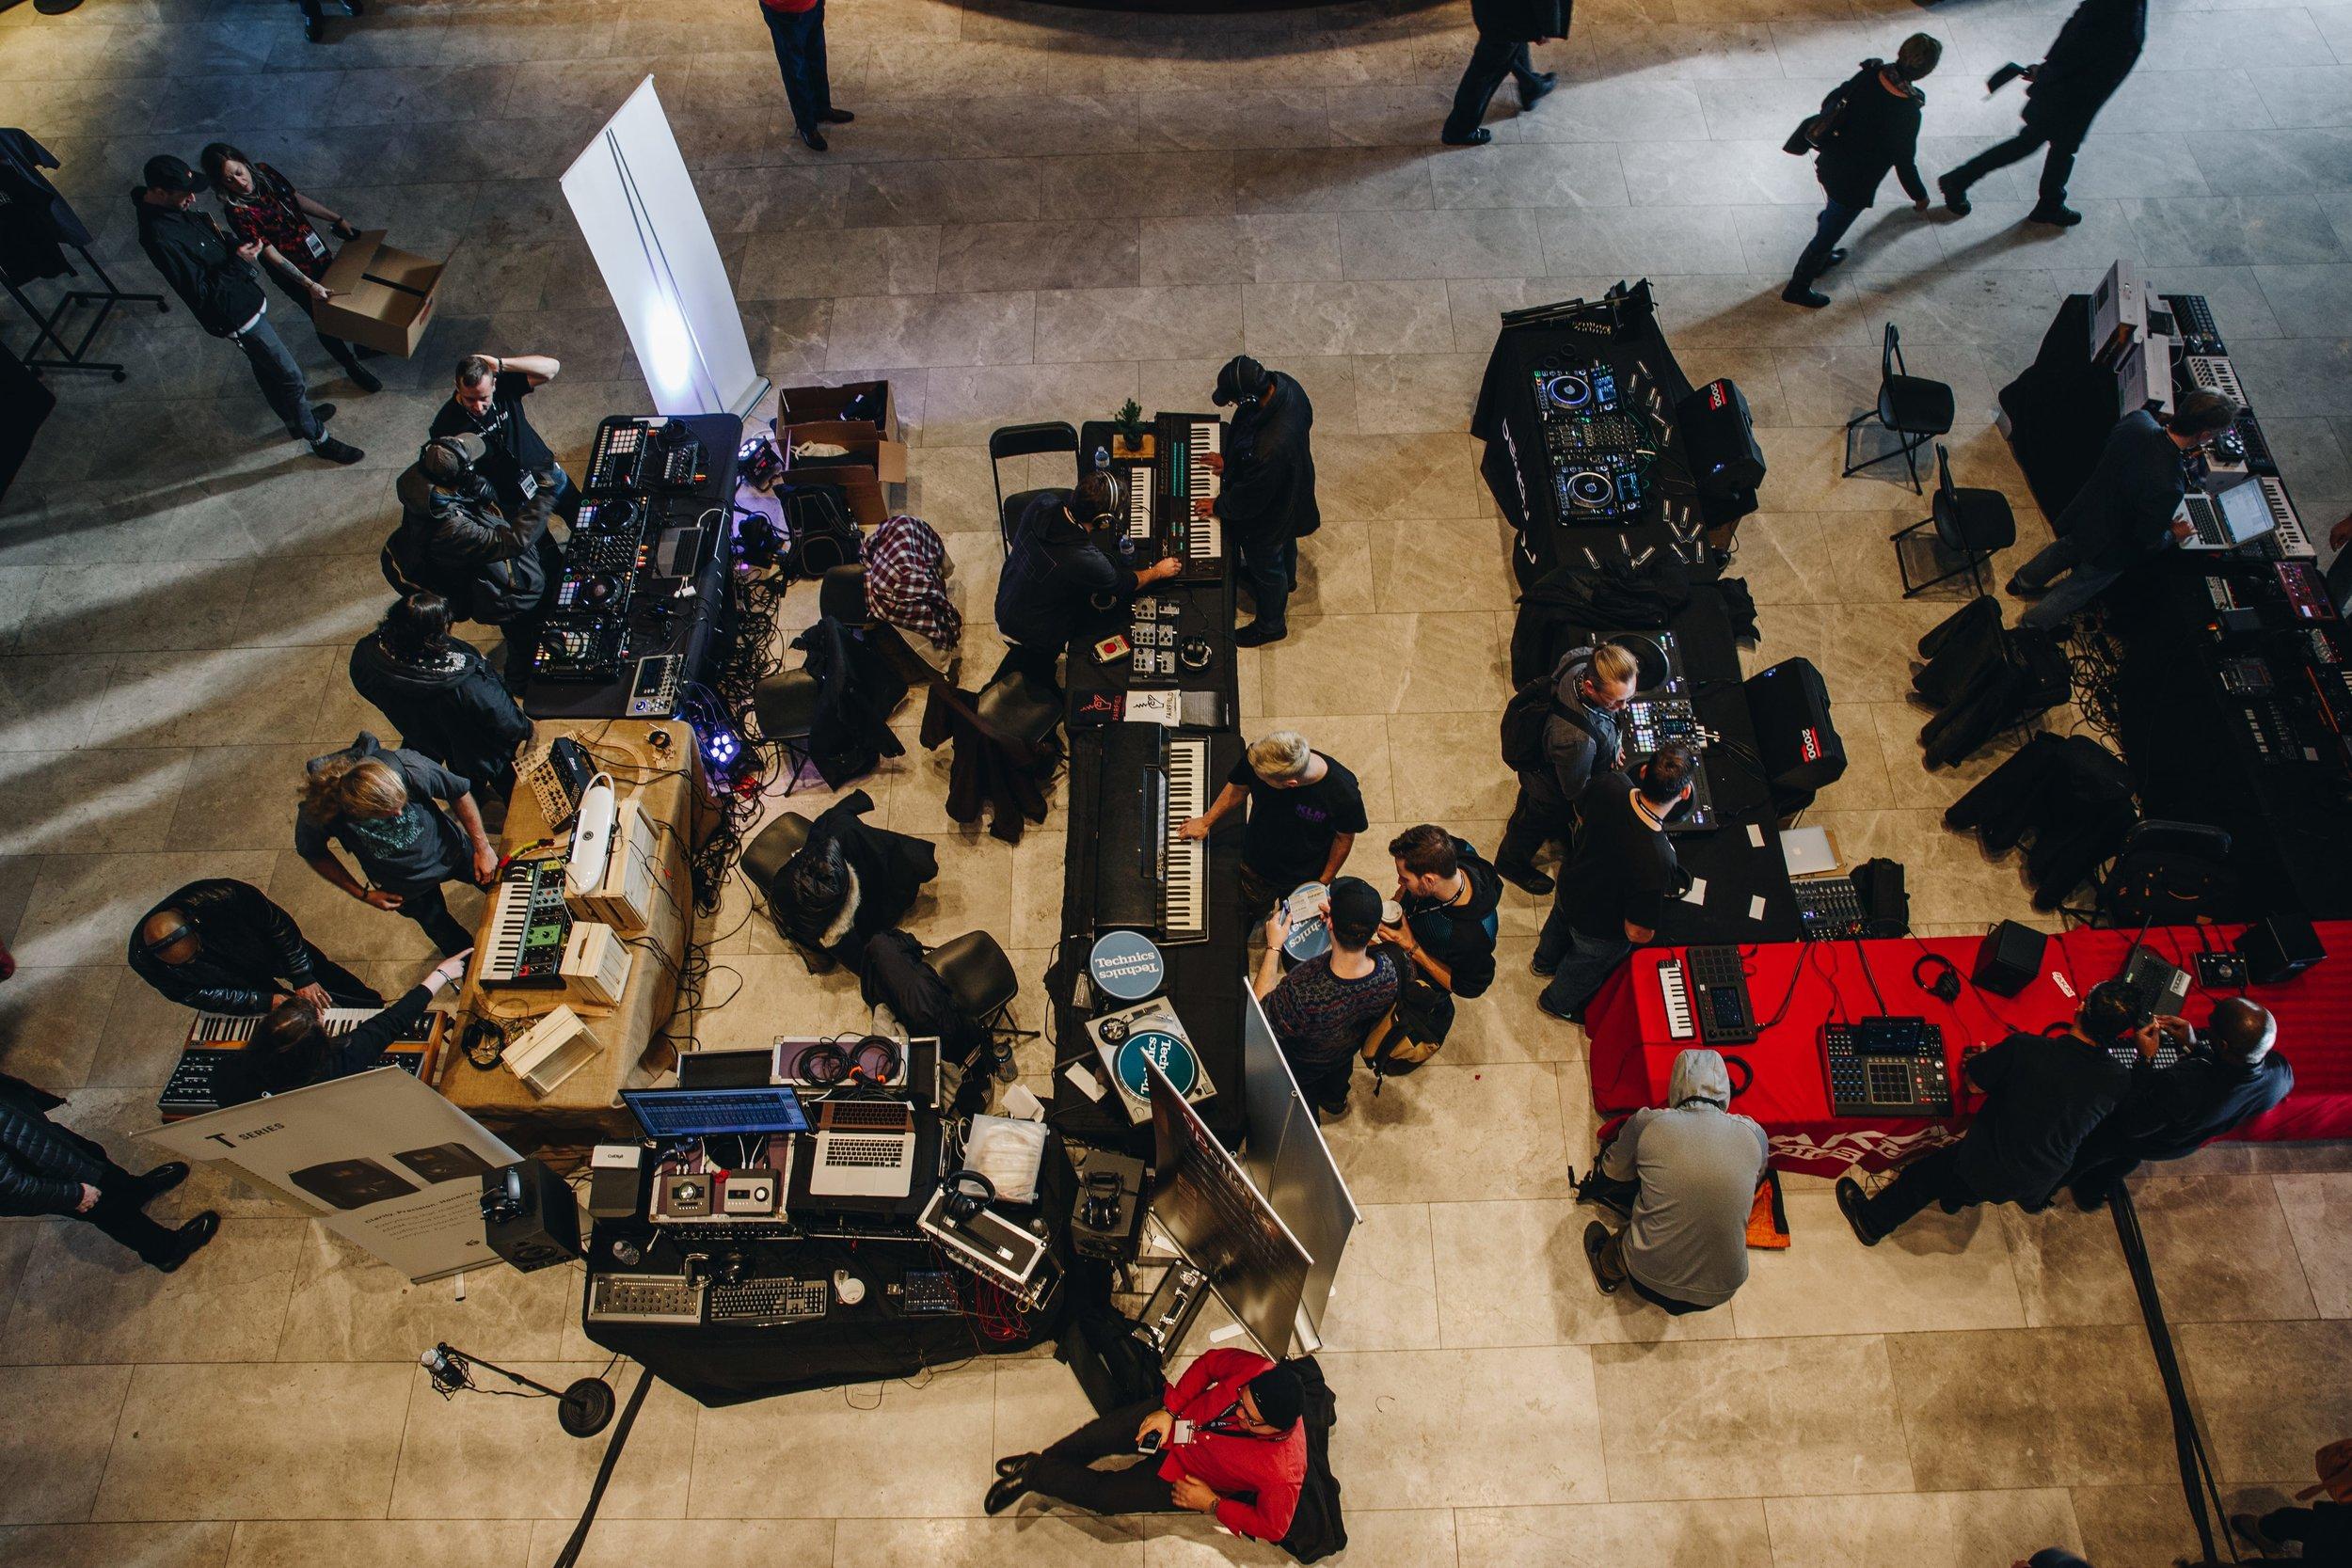 The AEMCON Marketplace Photo by Allan Cao